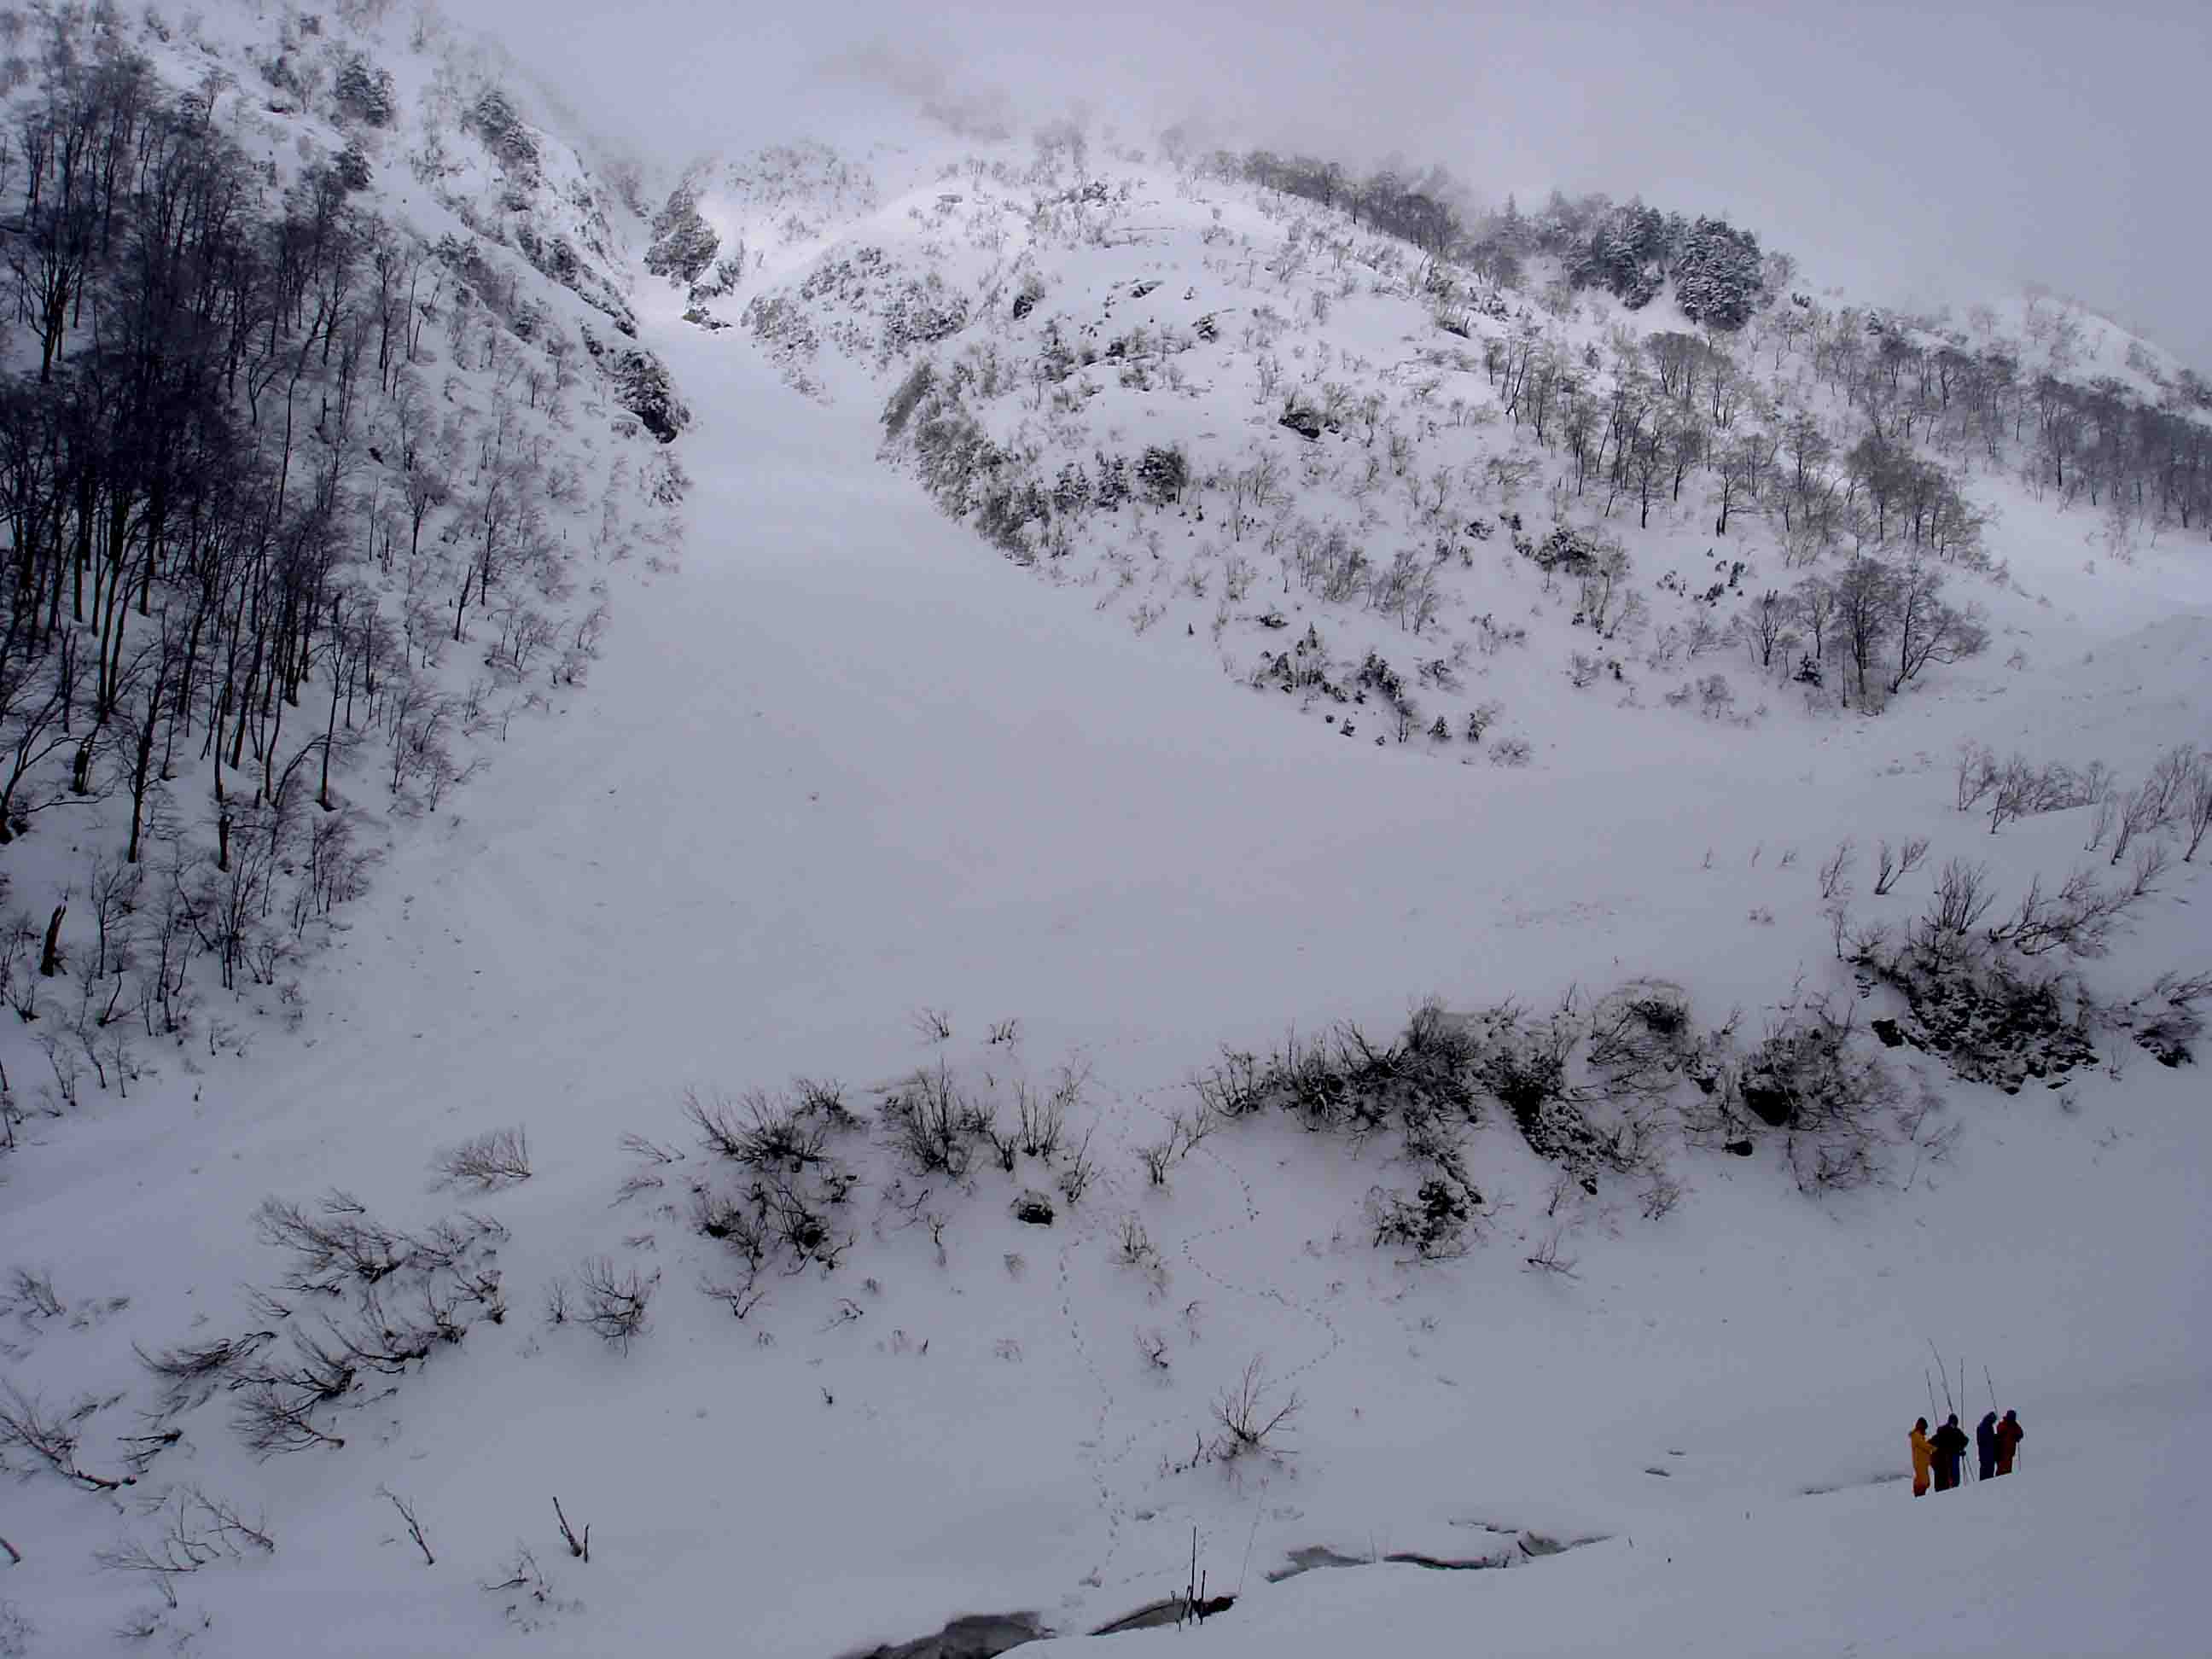 DSC08997 雪崩現場全体像